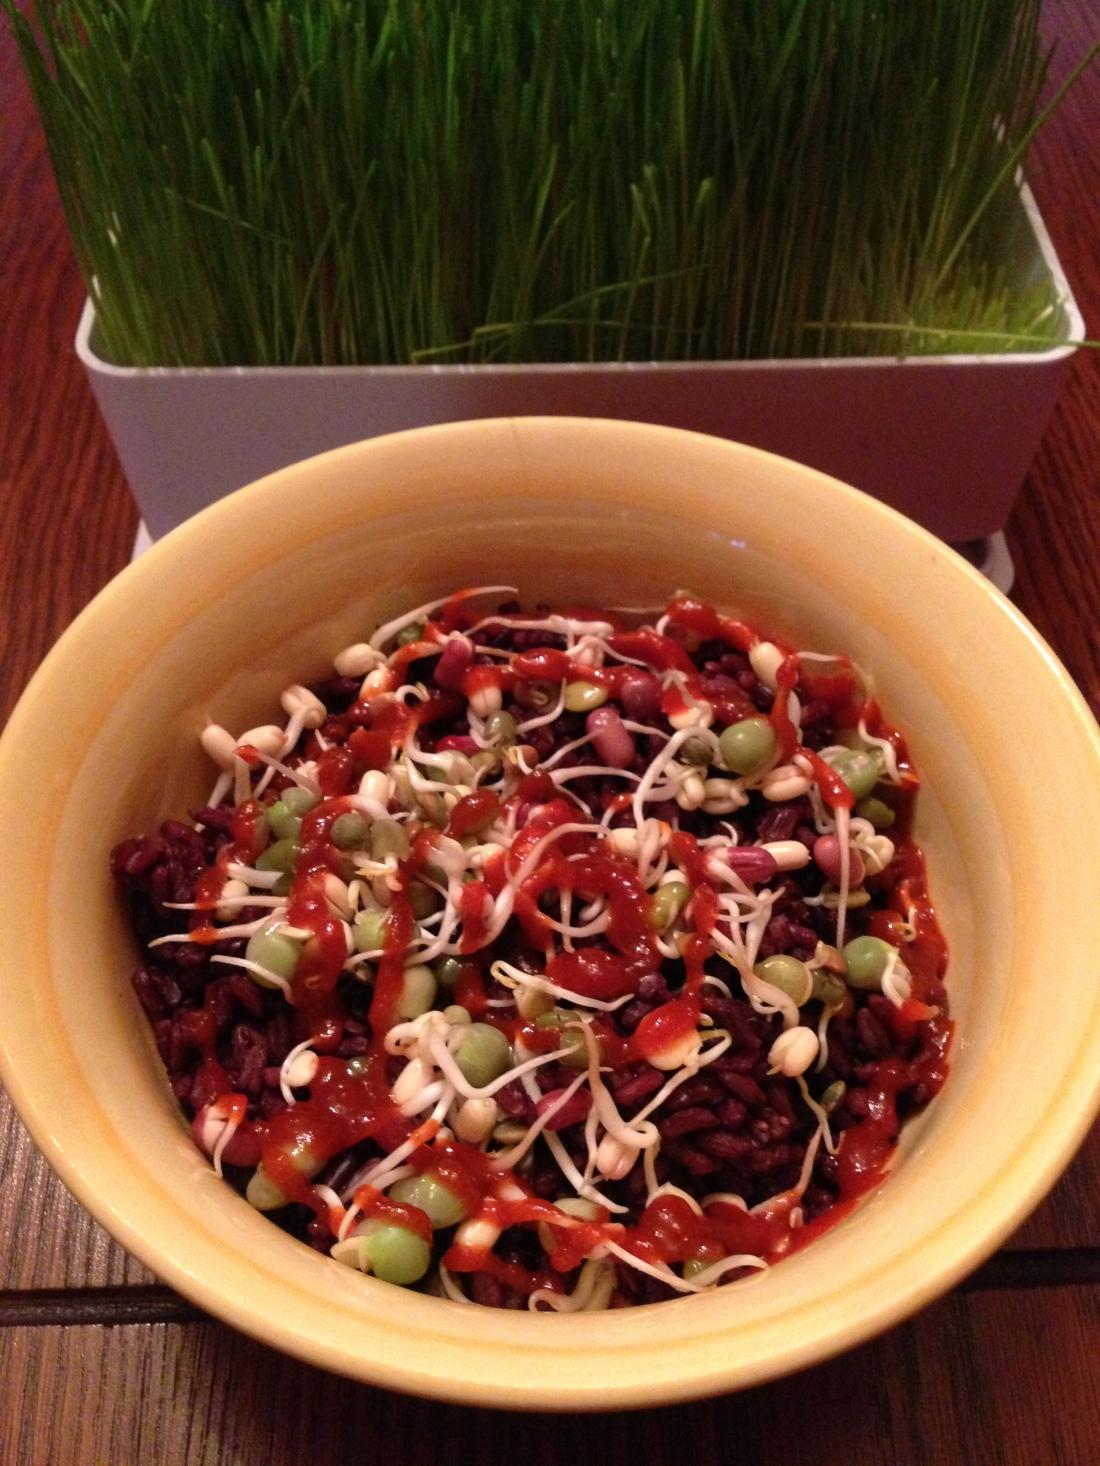 Black Rice, Bean Sprouts, Sriracha